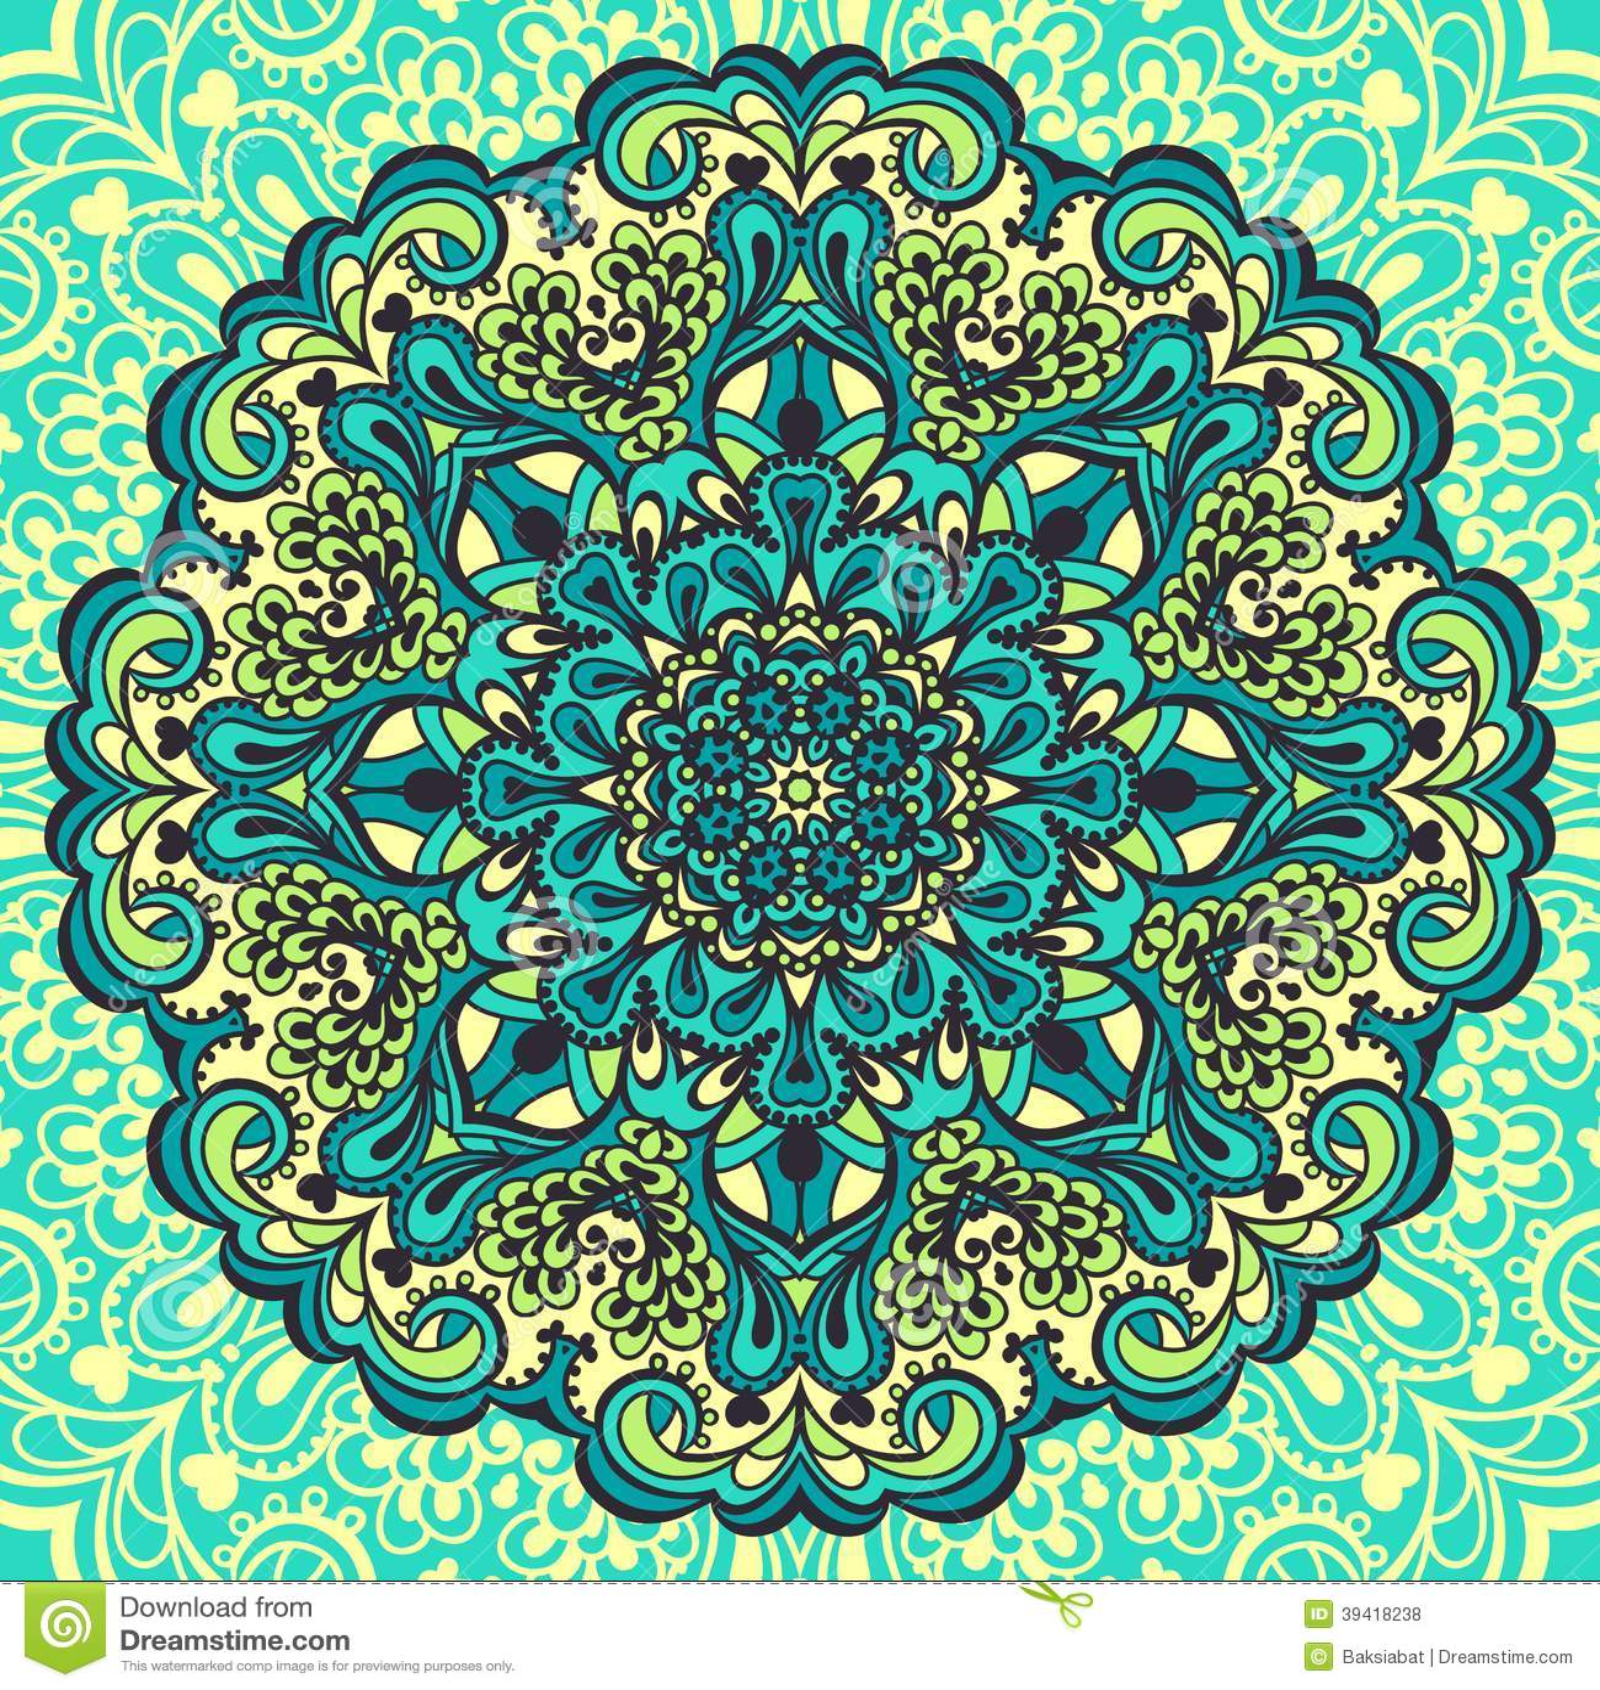 Vektor abbildung blumen mandala abstraktes element für design